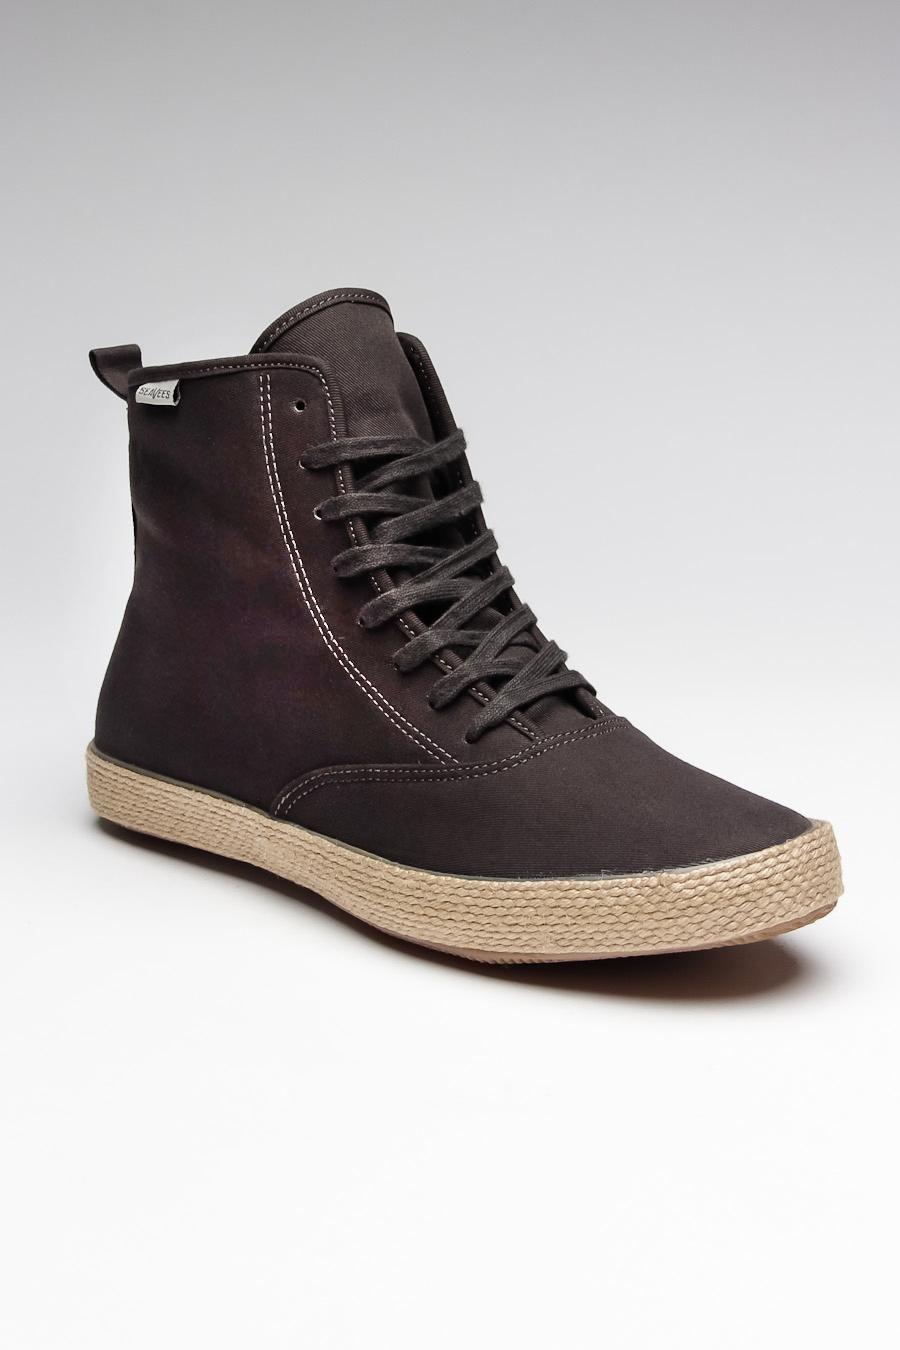 sale retailer dd31d bf42e SEAVEES DUNE BOOT   Jack Threads   Hombres   Pinterest   Botas, Zapatos y  Botas hombre